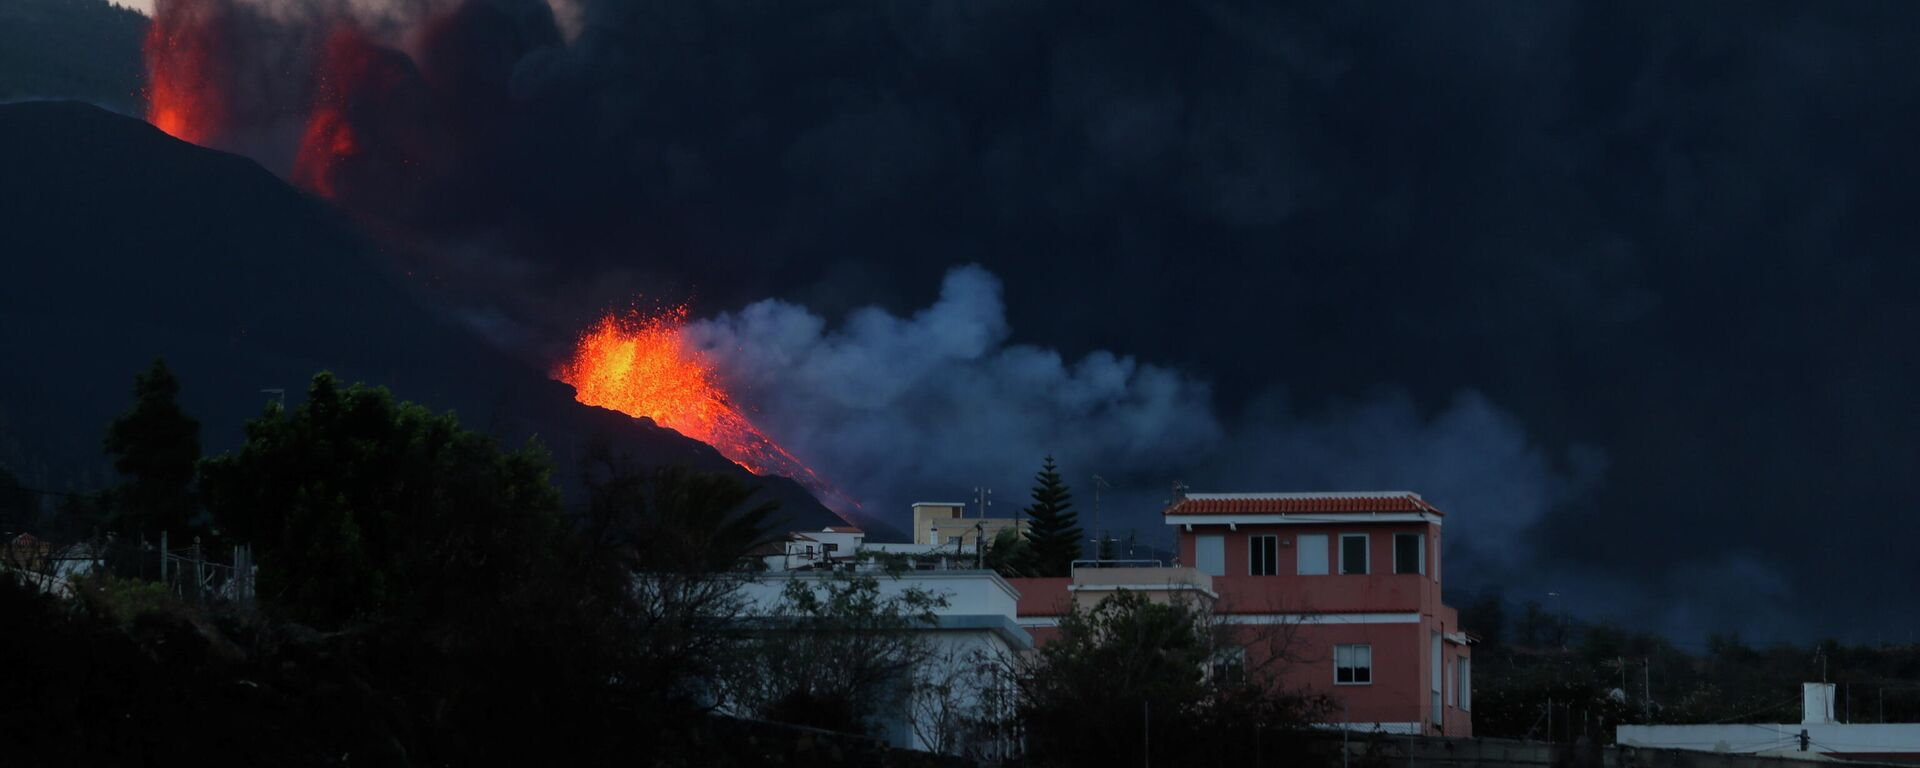 Erupción del volcán Cumbre Vieja en La Palma - Sputnik Mundo, 1920, 14.10.2021